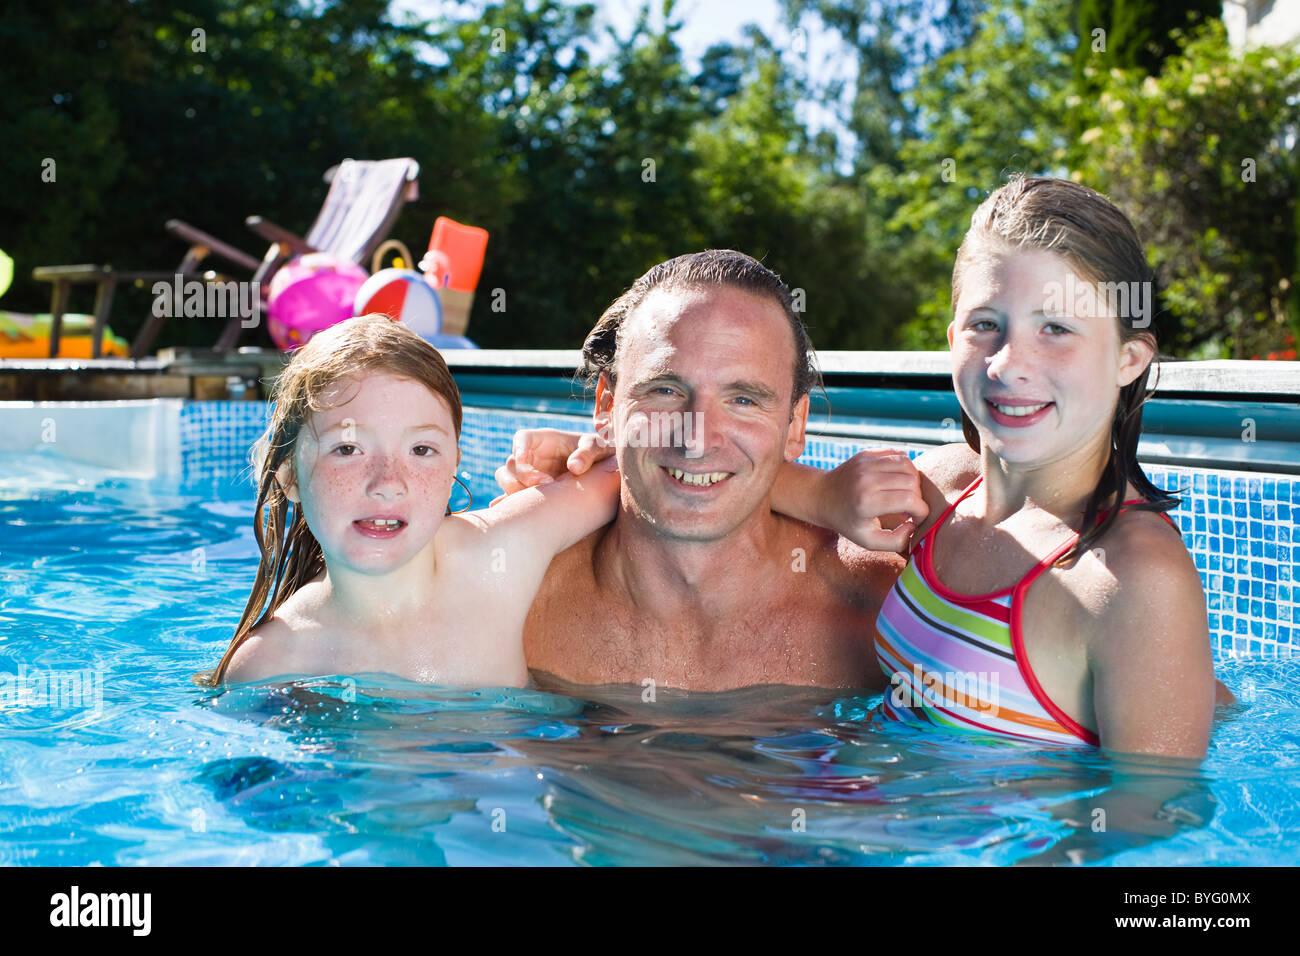 Girls in bikinis stock photos girls in bikinis stock - Swimming pool girl christmas vacation ...